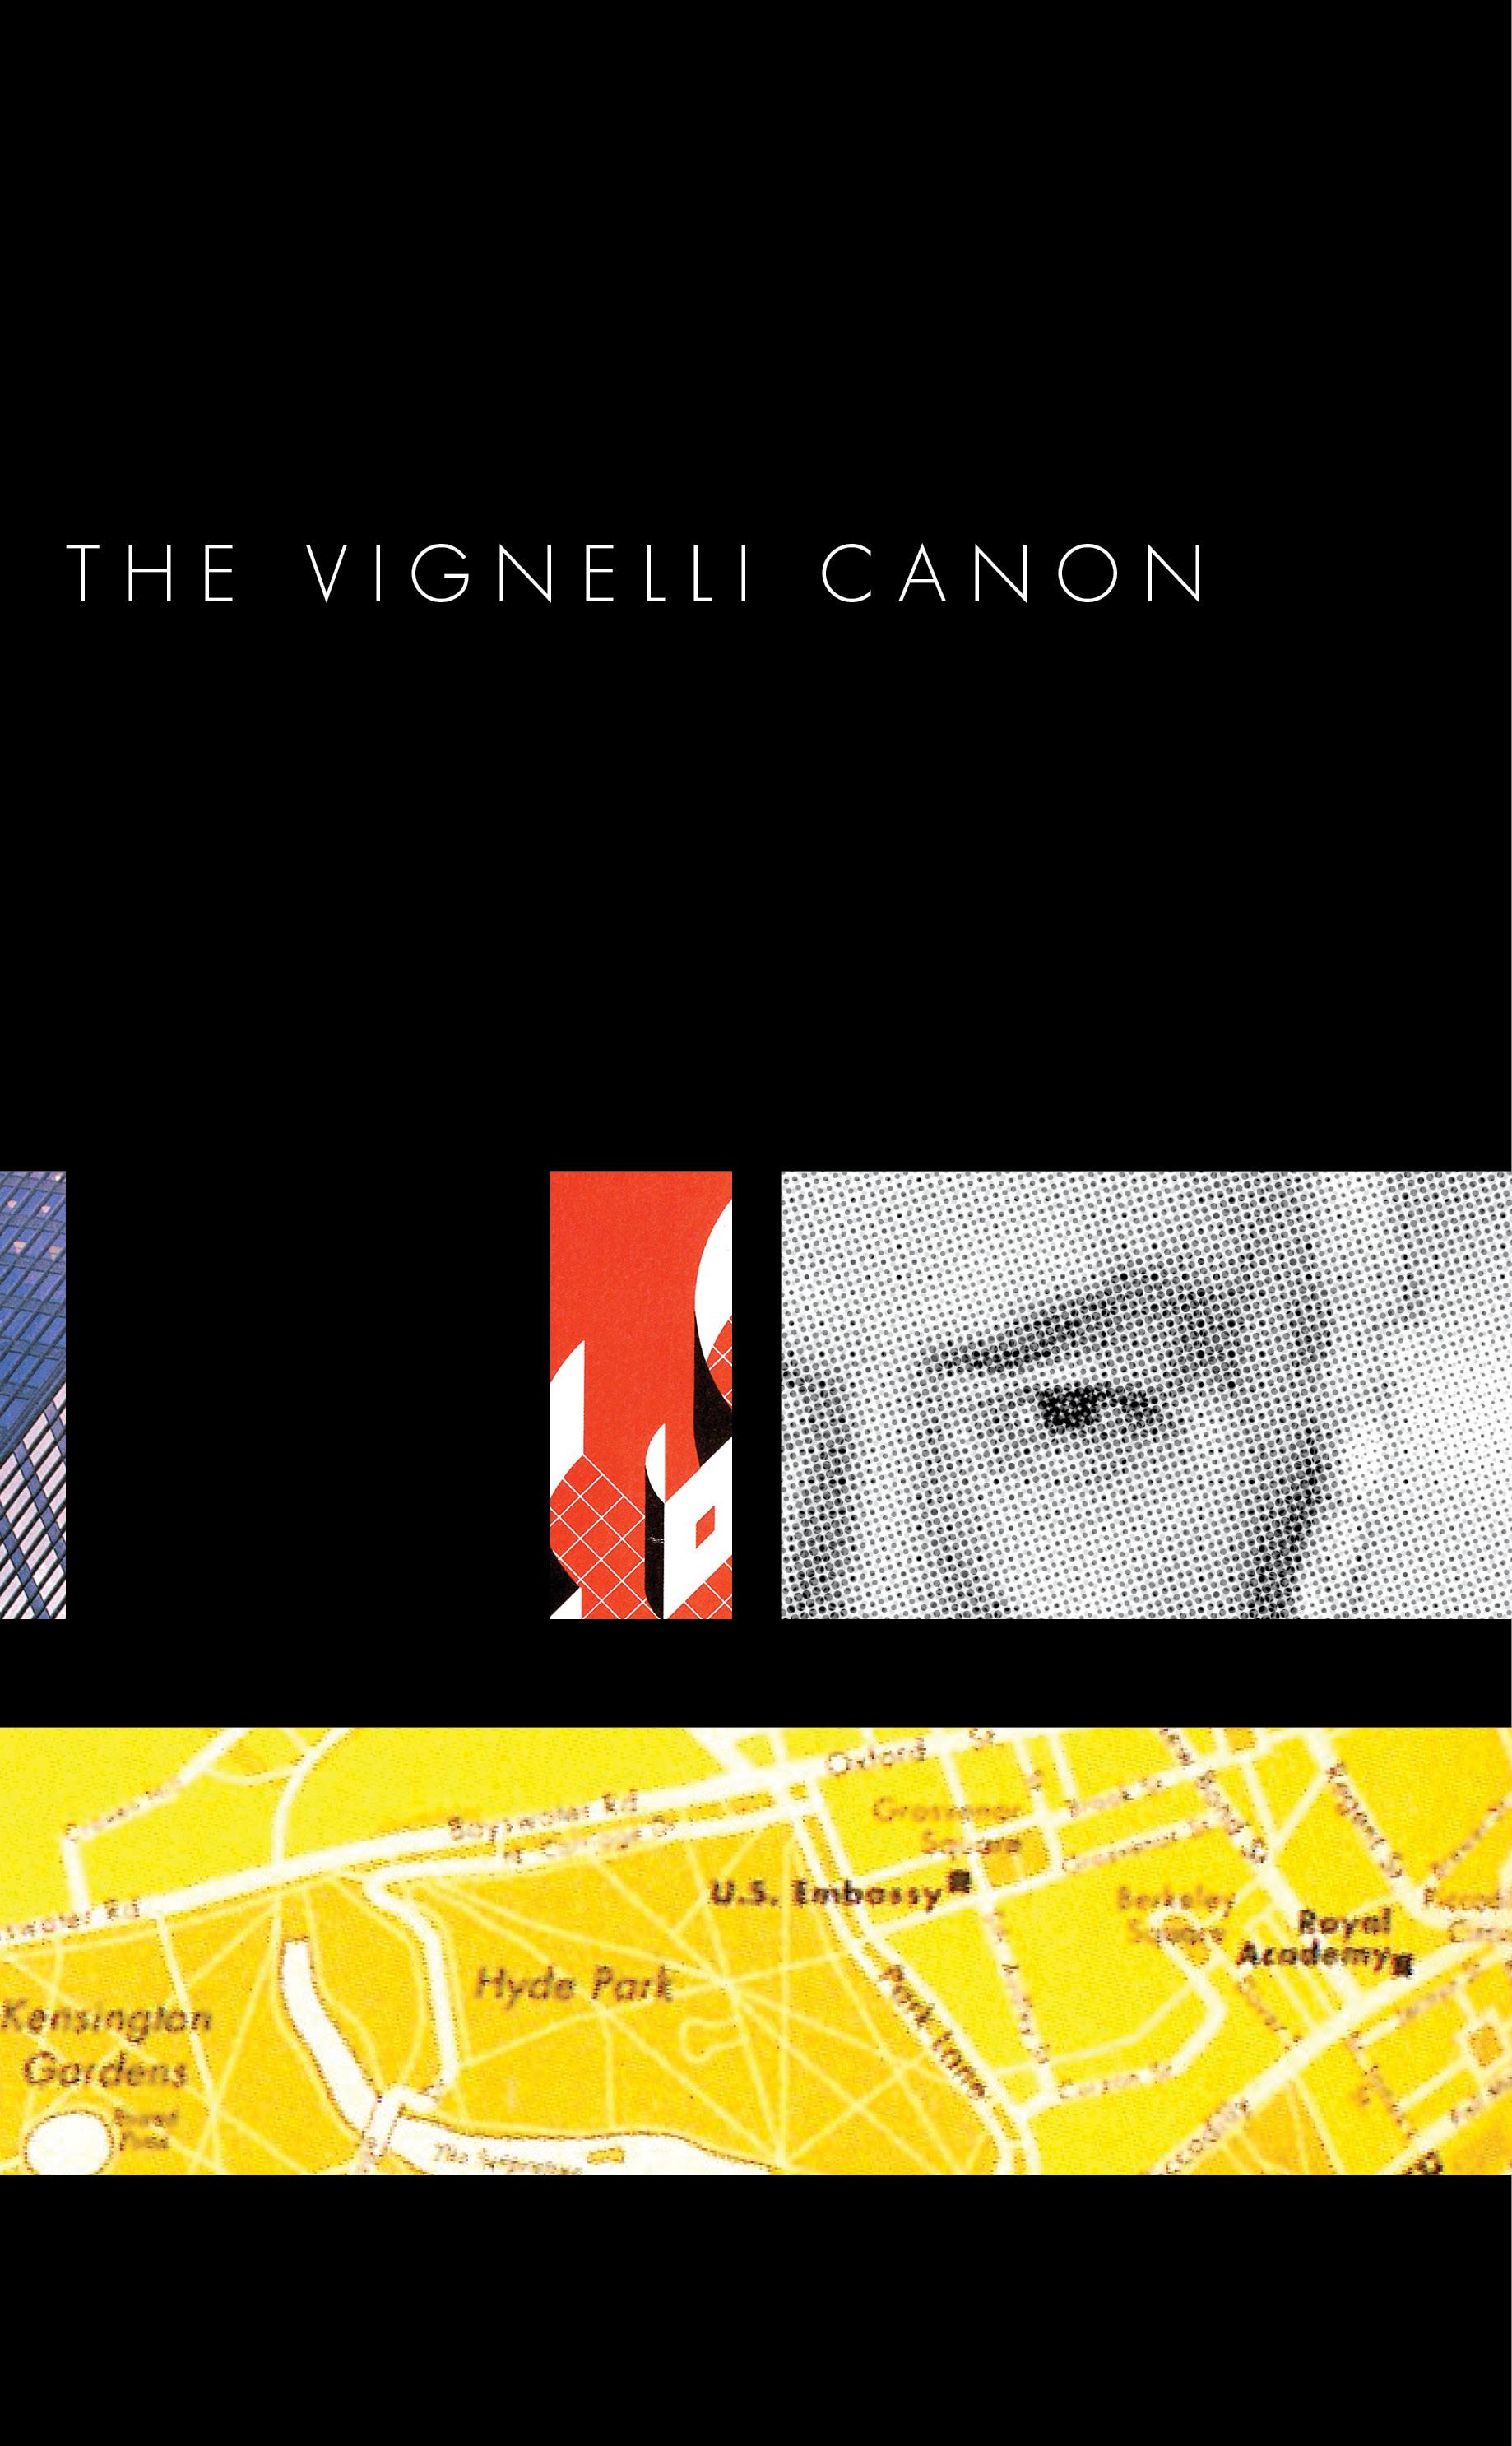 Vignelli_layouts3.jpg